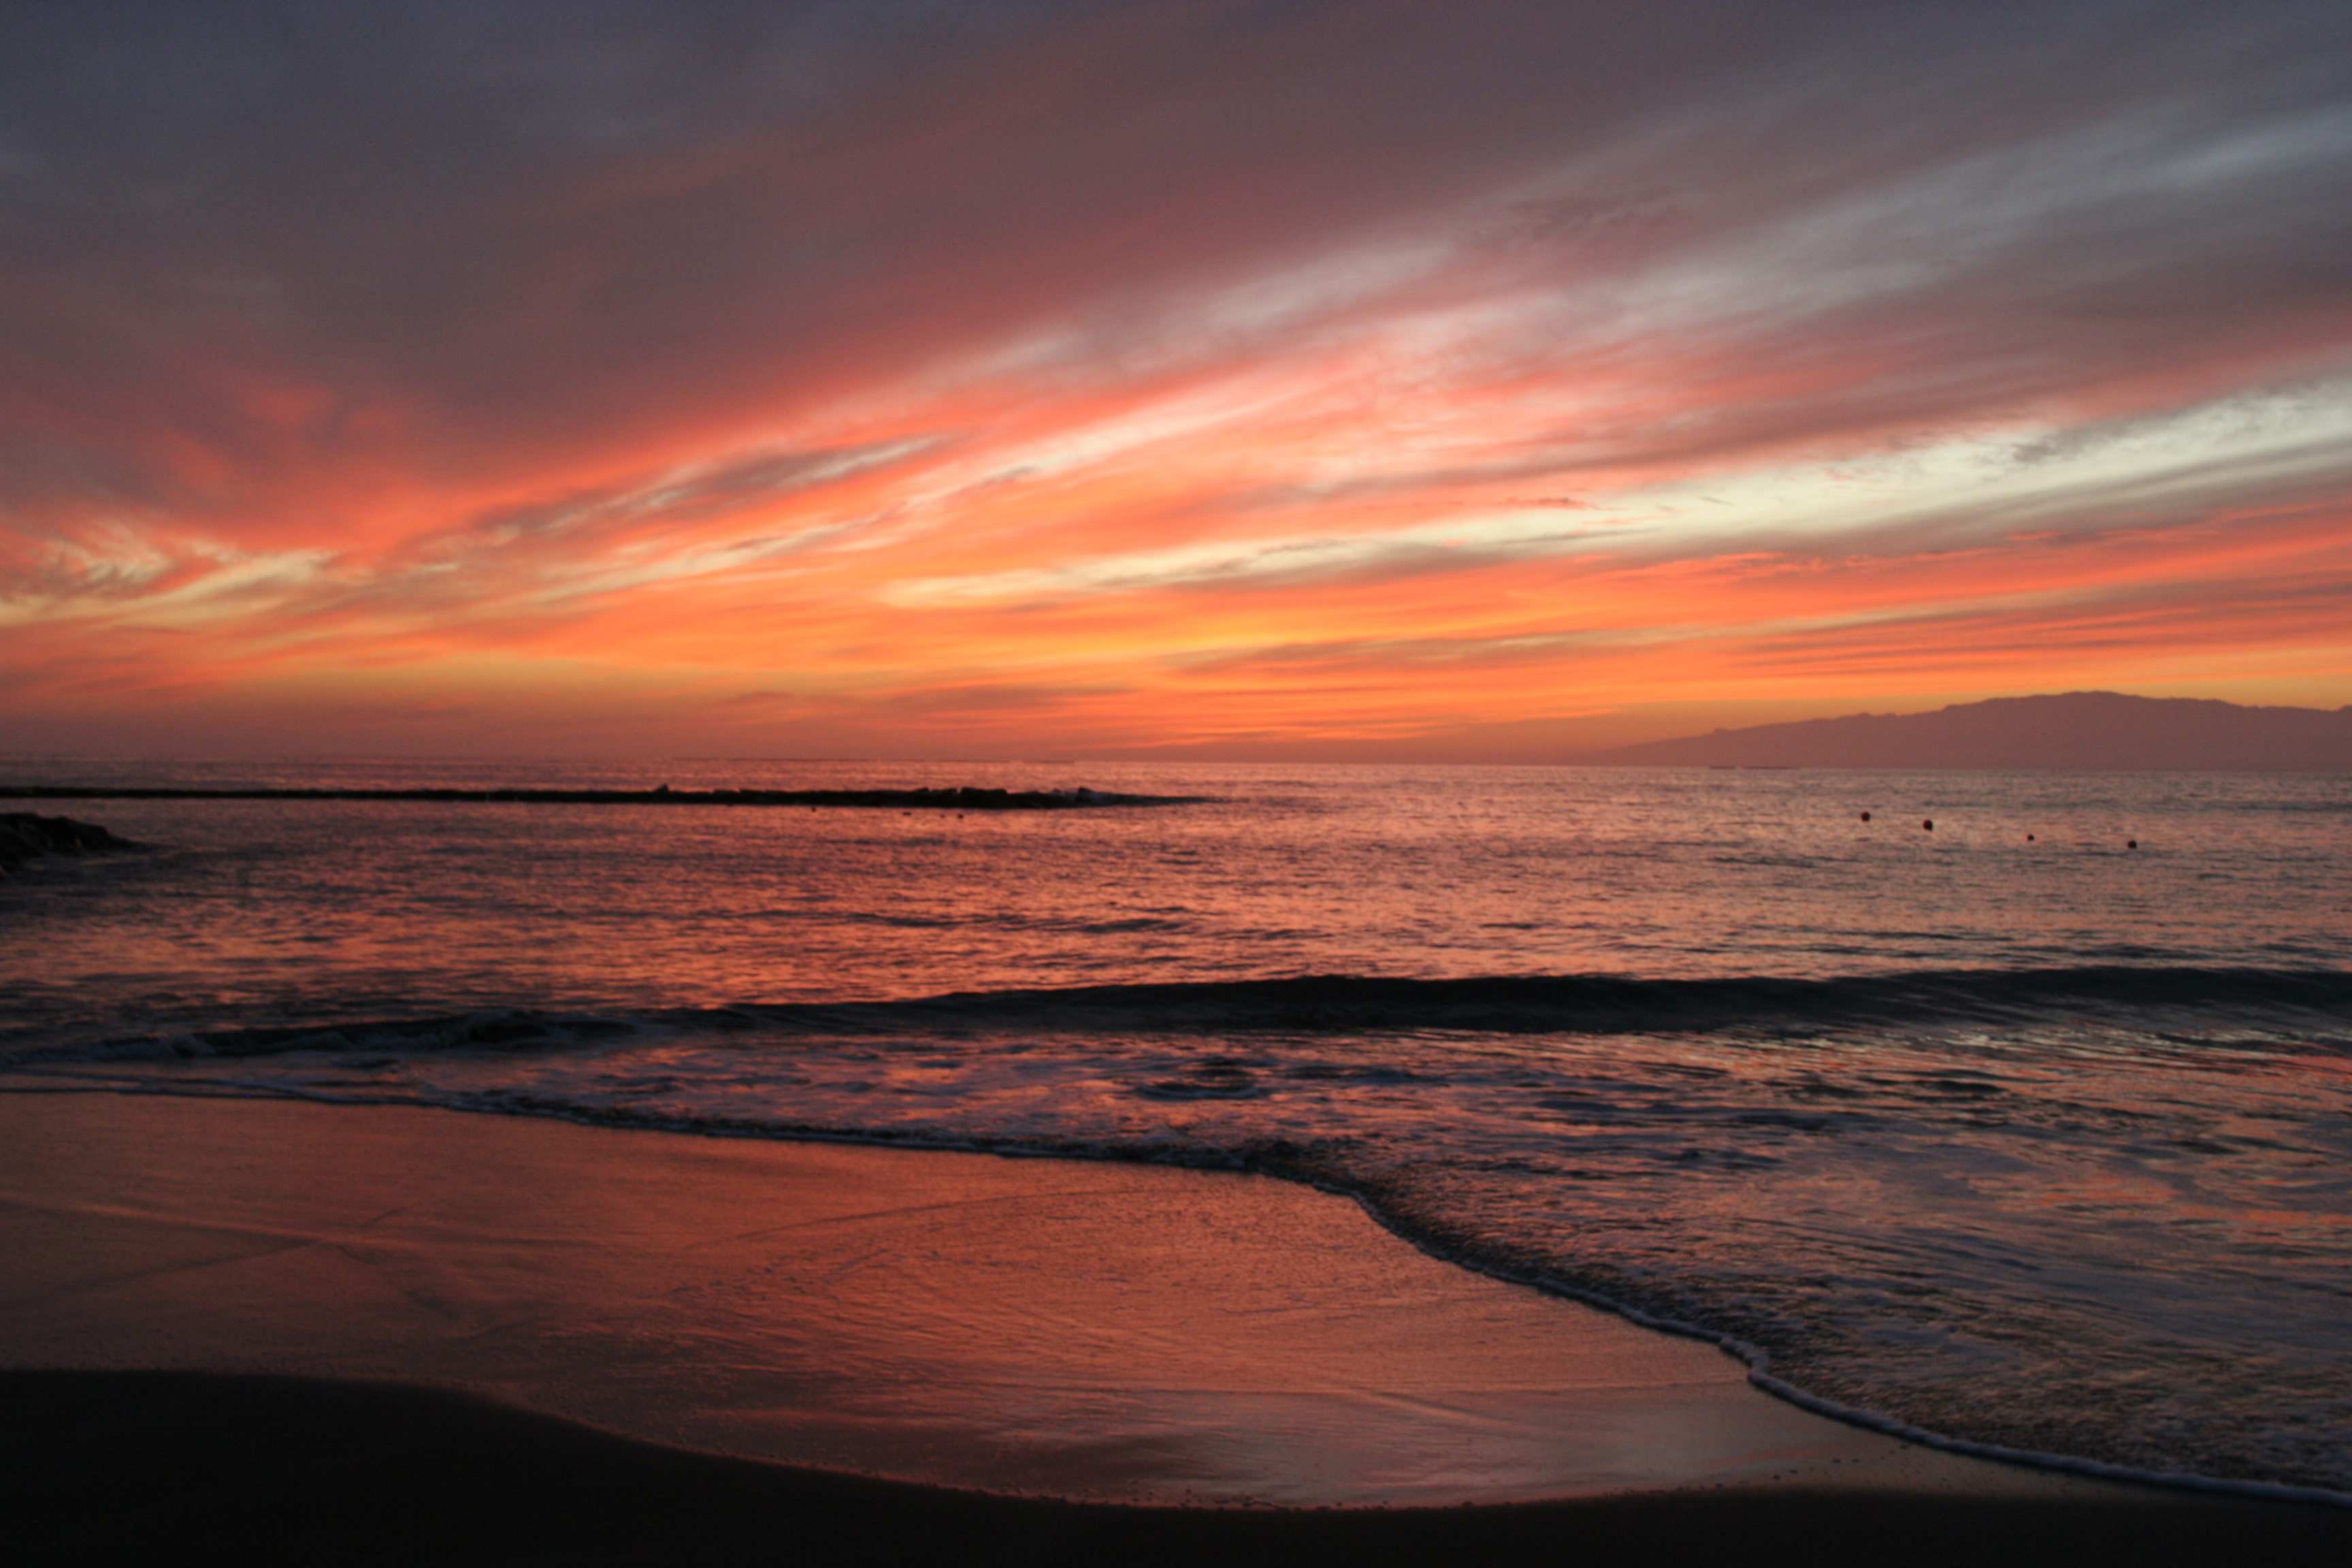 Fanabe Beach Sunset HD Wallpaper | Nature Wallpapers